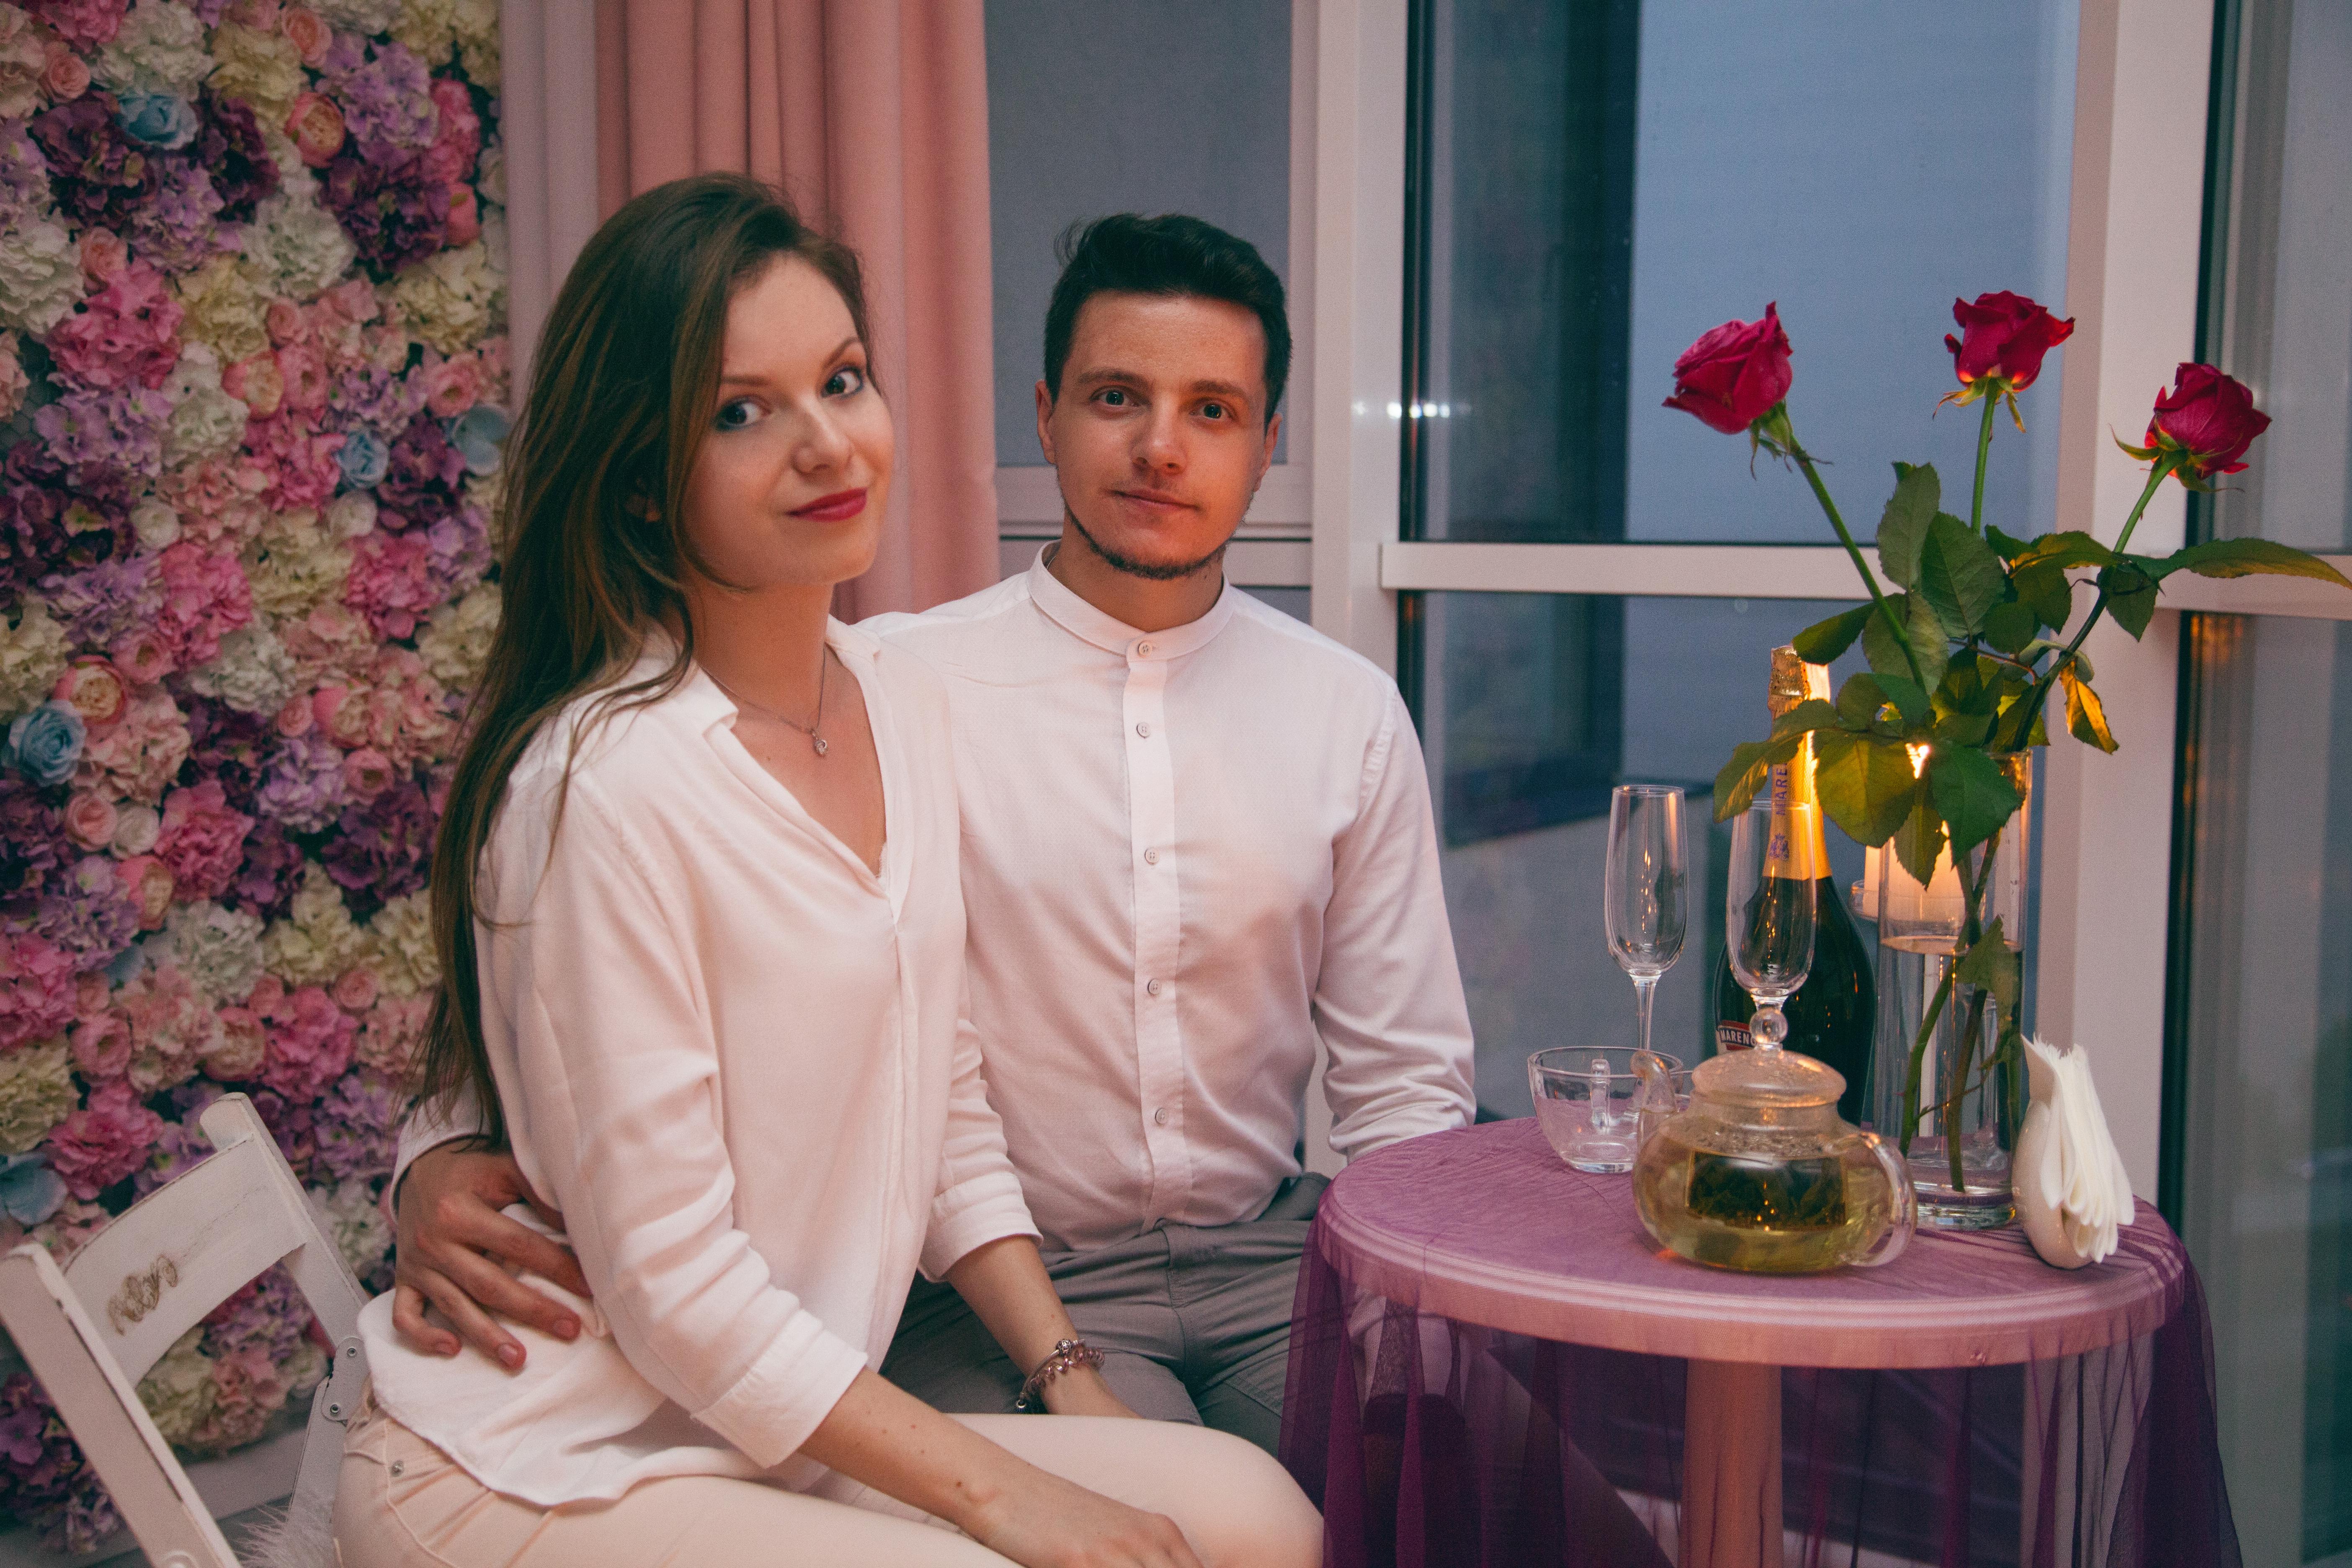 Ресторан для двоих от сервиса романтики Альтечо (3)